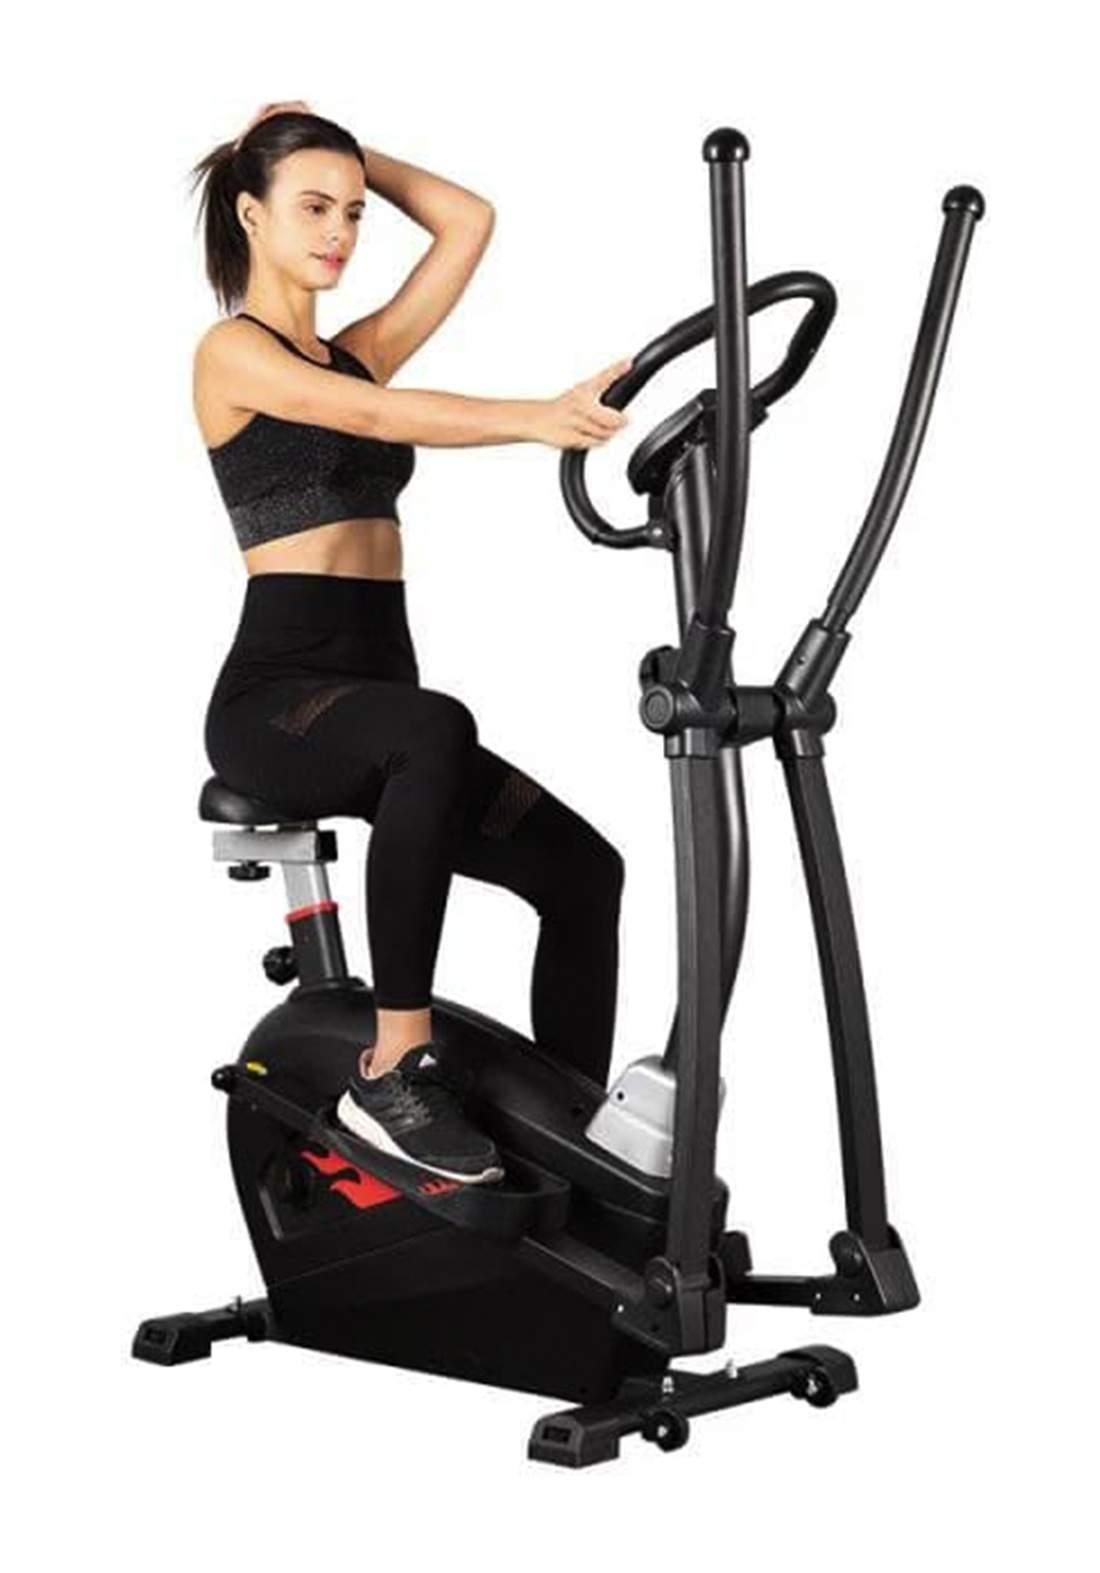 Fnova Trainer Exercise Machine جهاز التمارين الرياضية